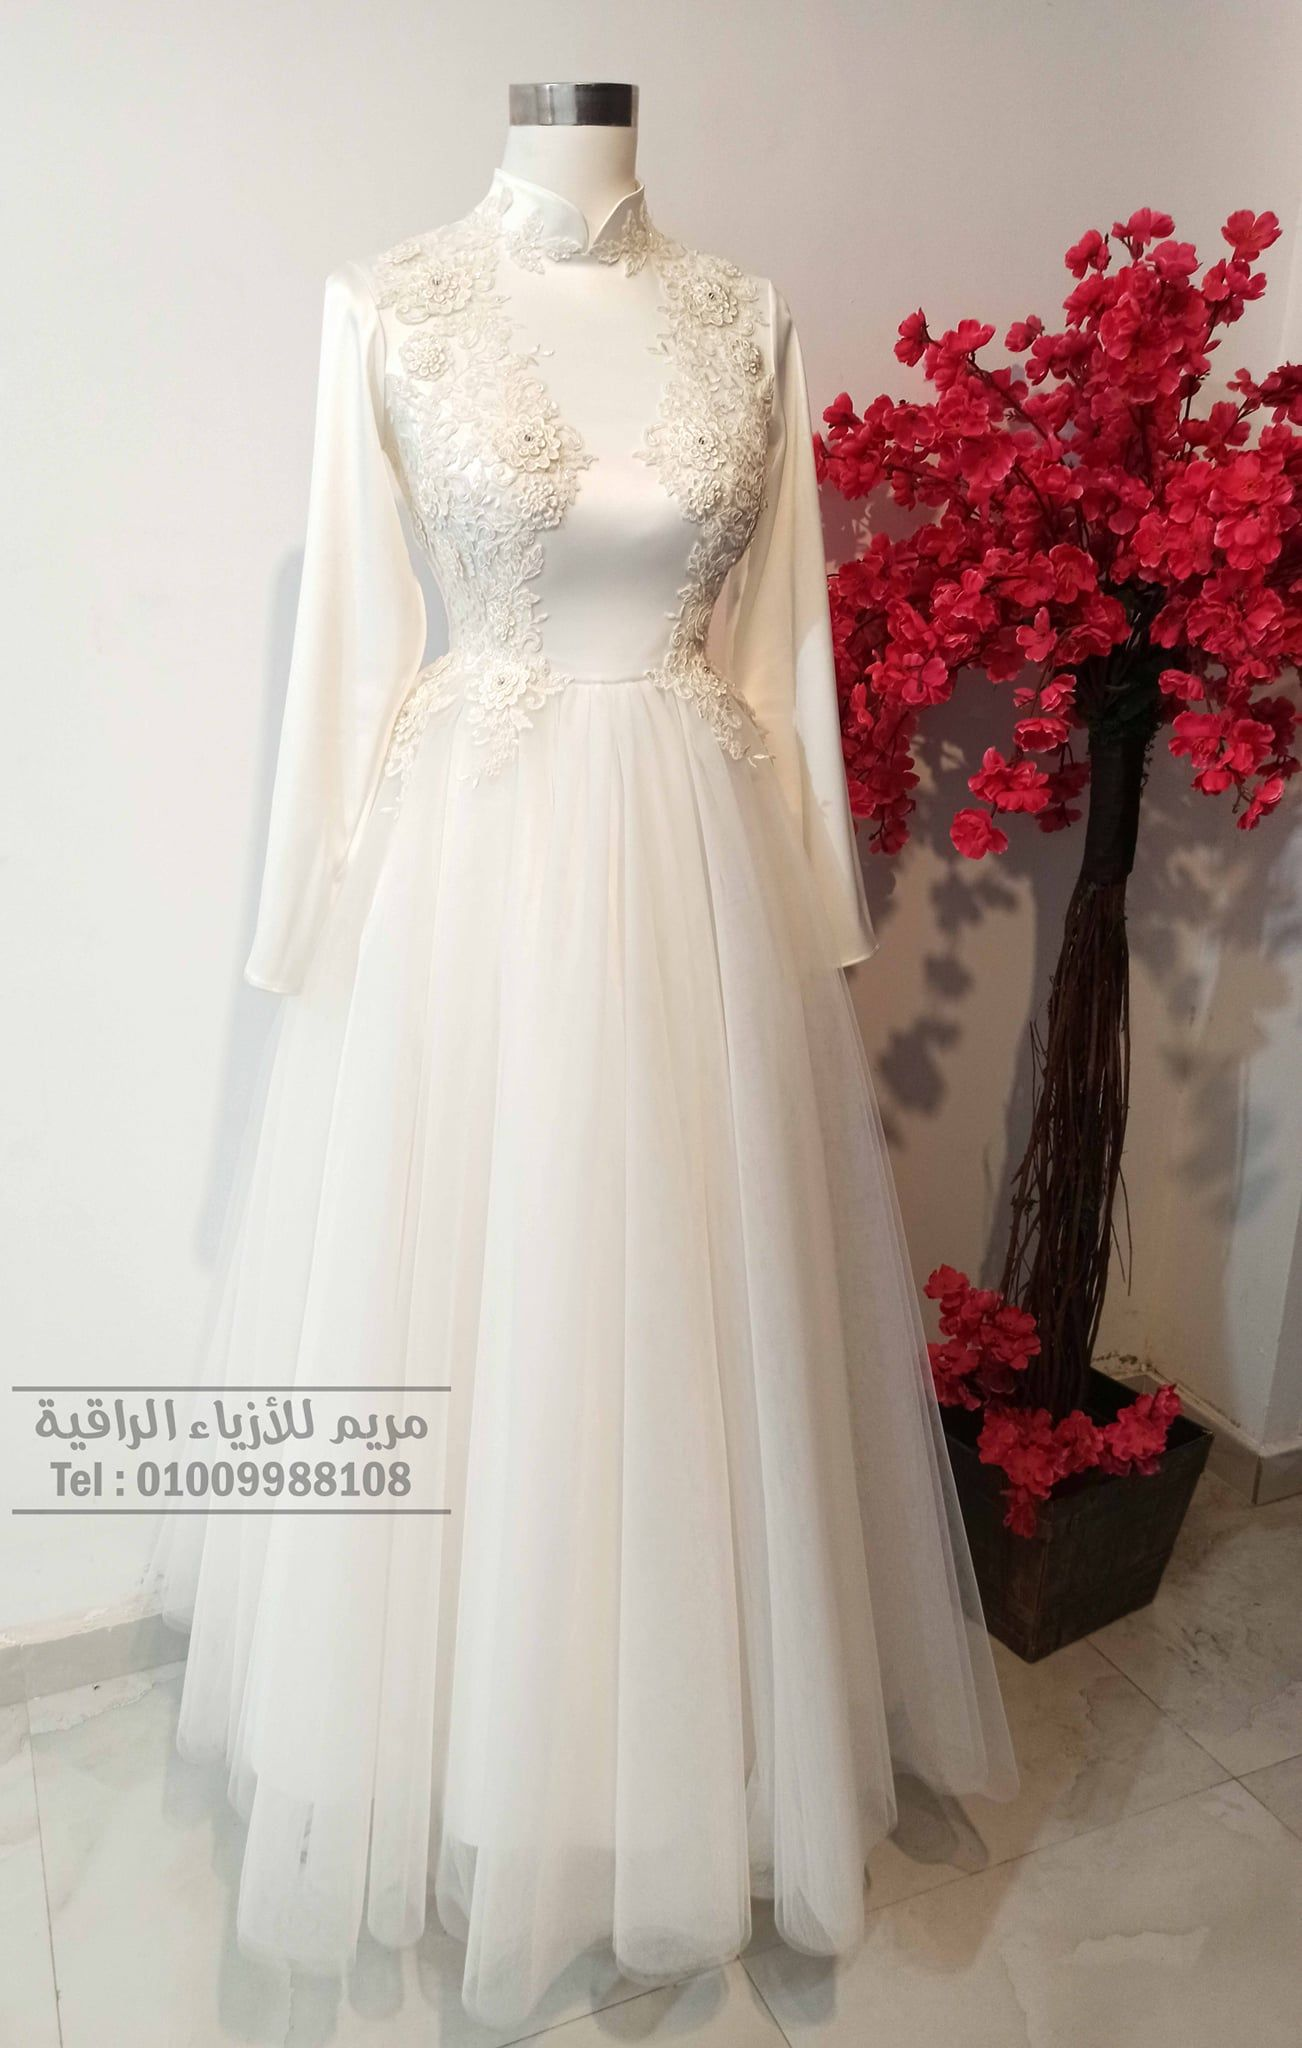 Pin By Maryam Haute Couture مريم لل On فساتين مريم للأزياء الراقية In 2021 Dresses Prom Dresses Long Bridal Outfits